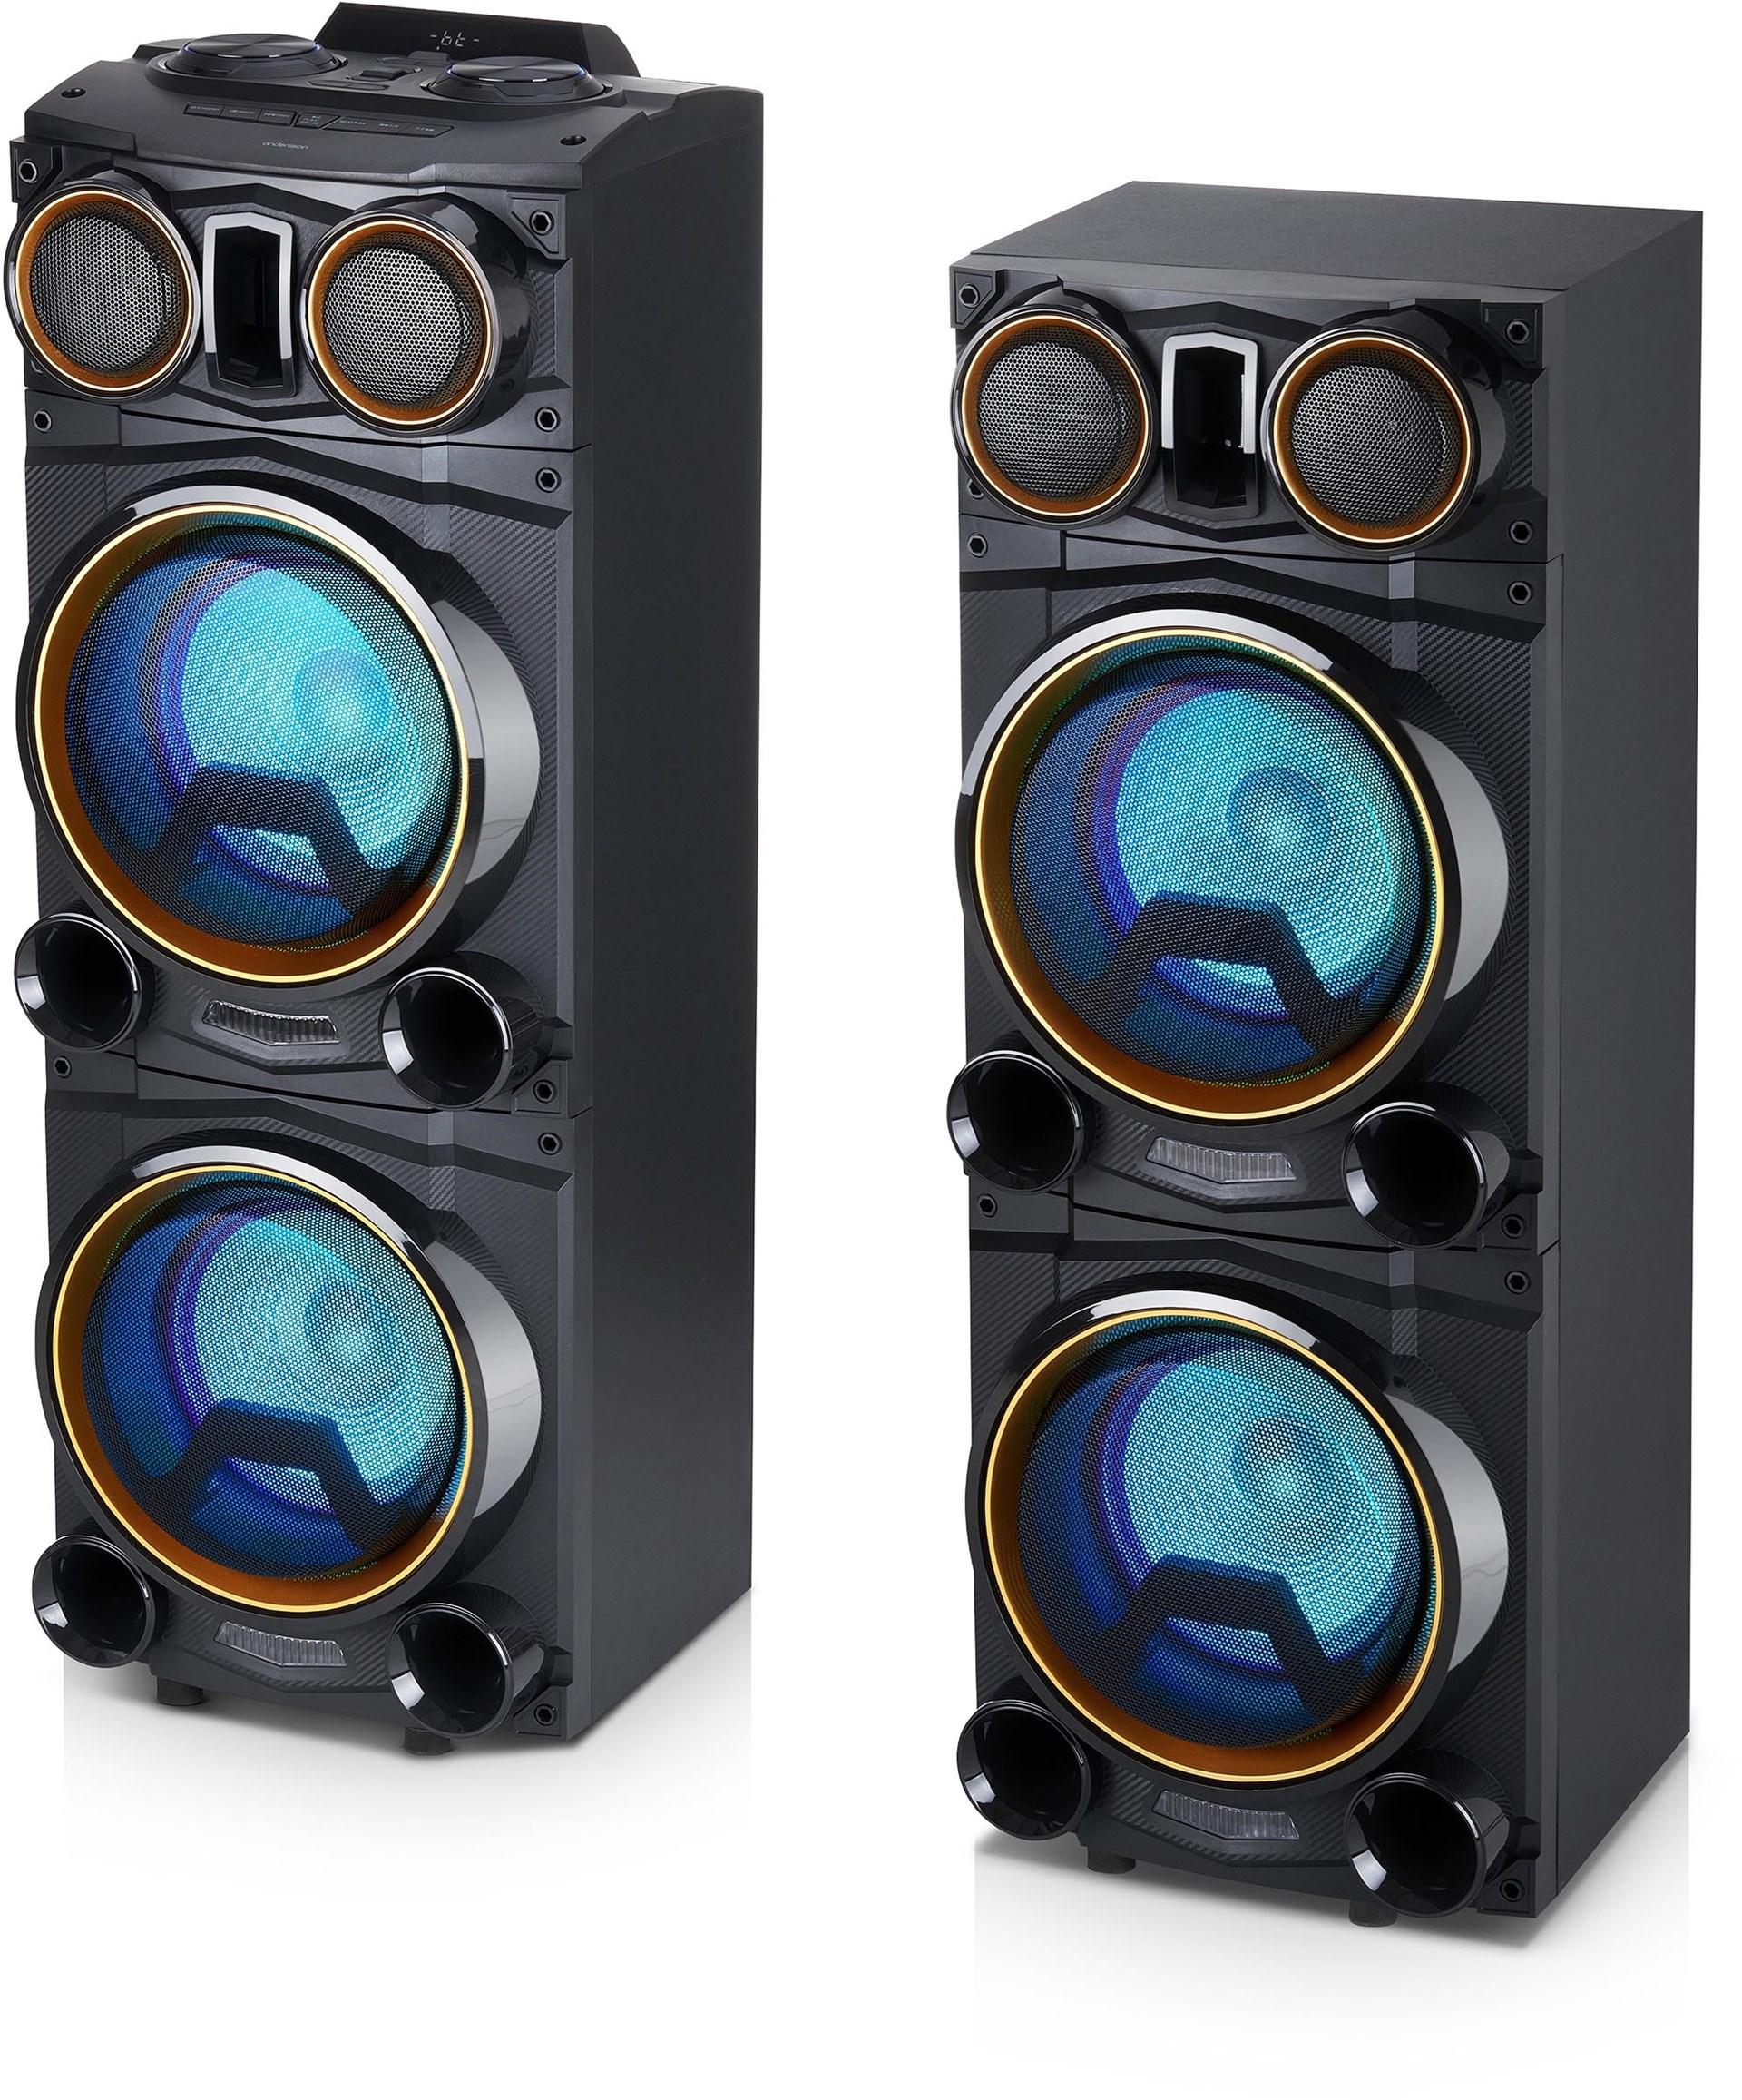 Unika Andersson PYB-6000 - Dubbla Bluetooth-högtalare för fest PK-26